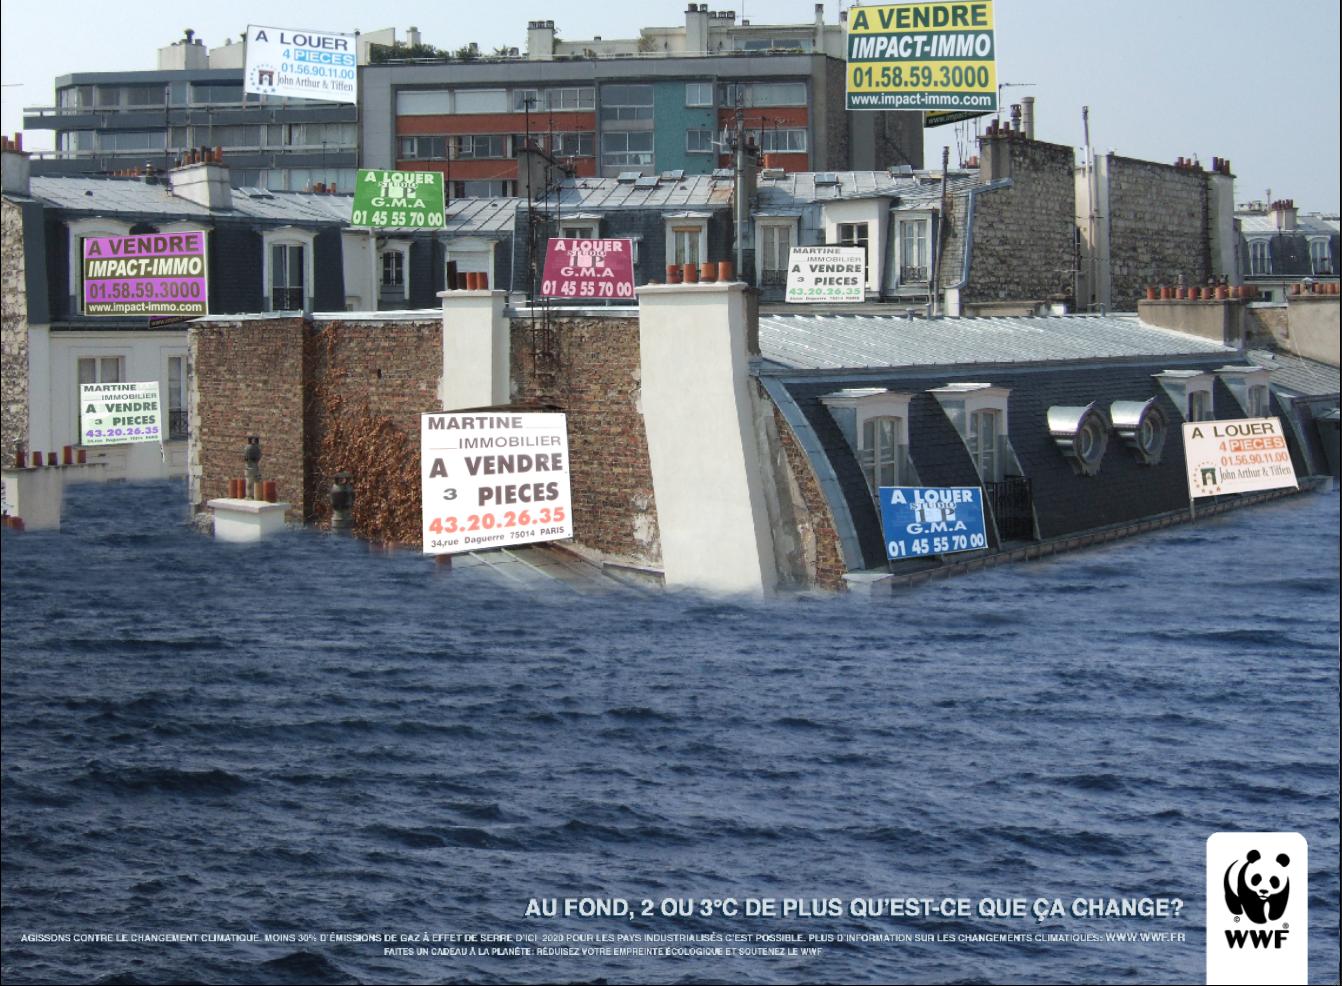 Inondation Rechauffement Clim - Global Warming / WWF